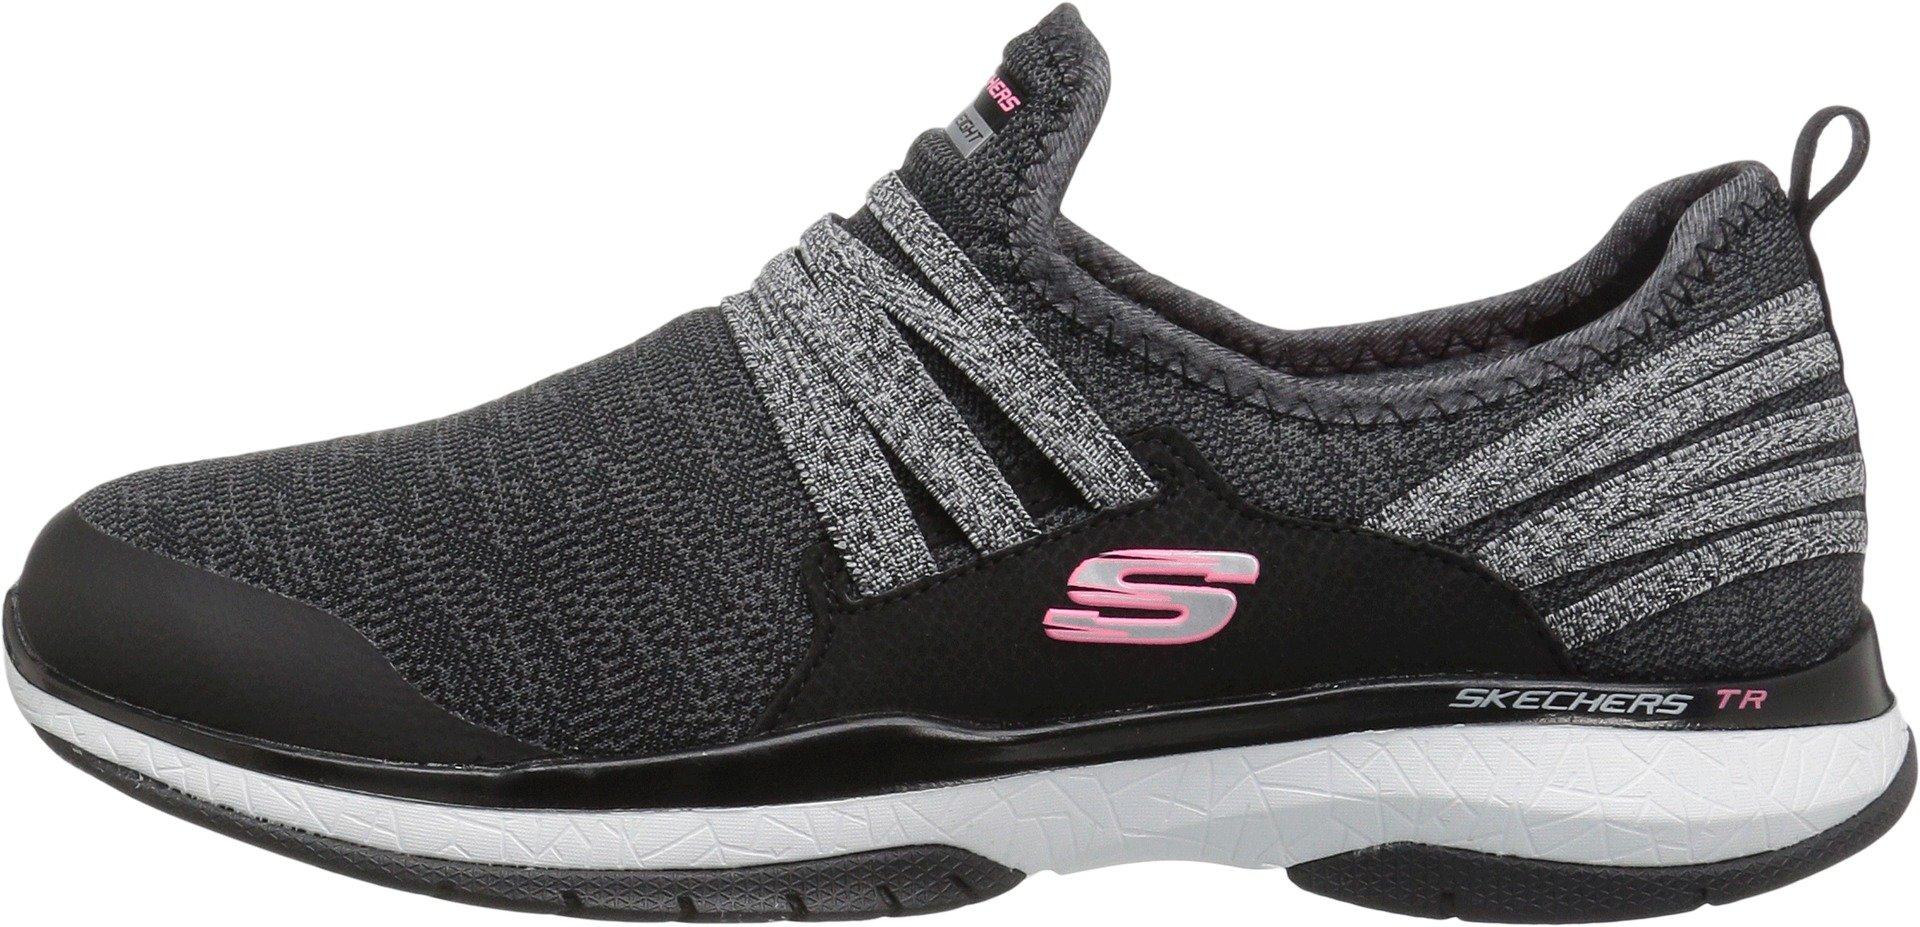 Skechers Burst TR Womens Sneakers Black/White 7.5 UC8MAp